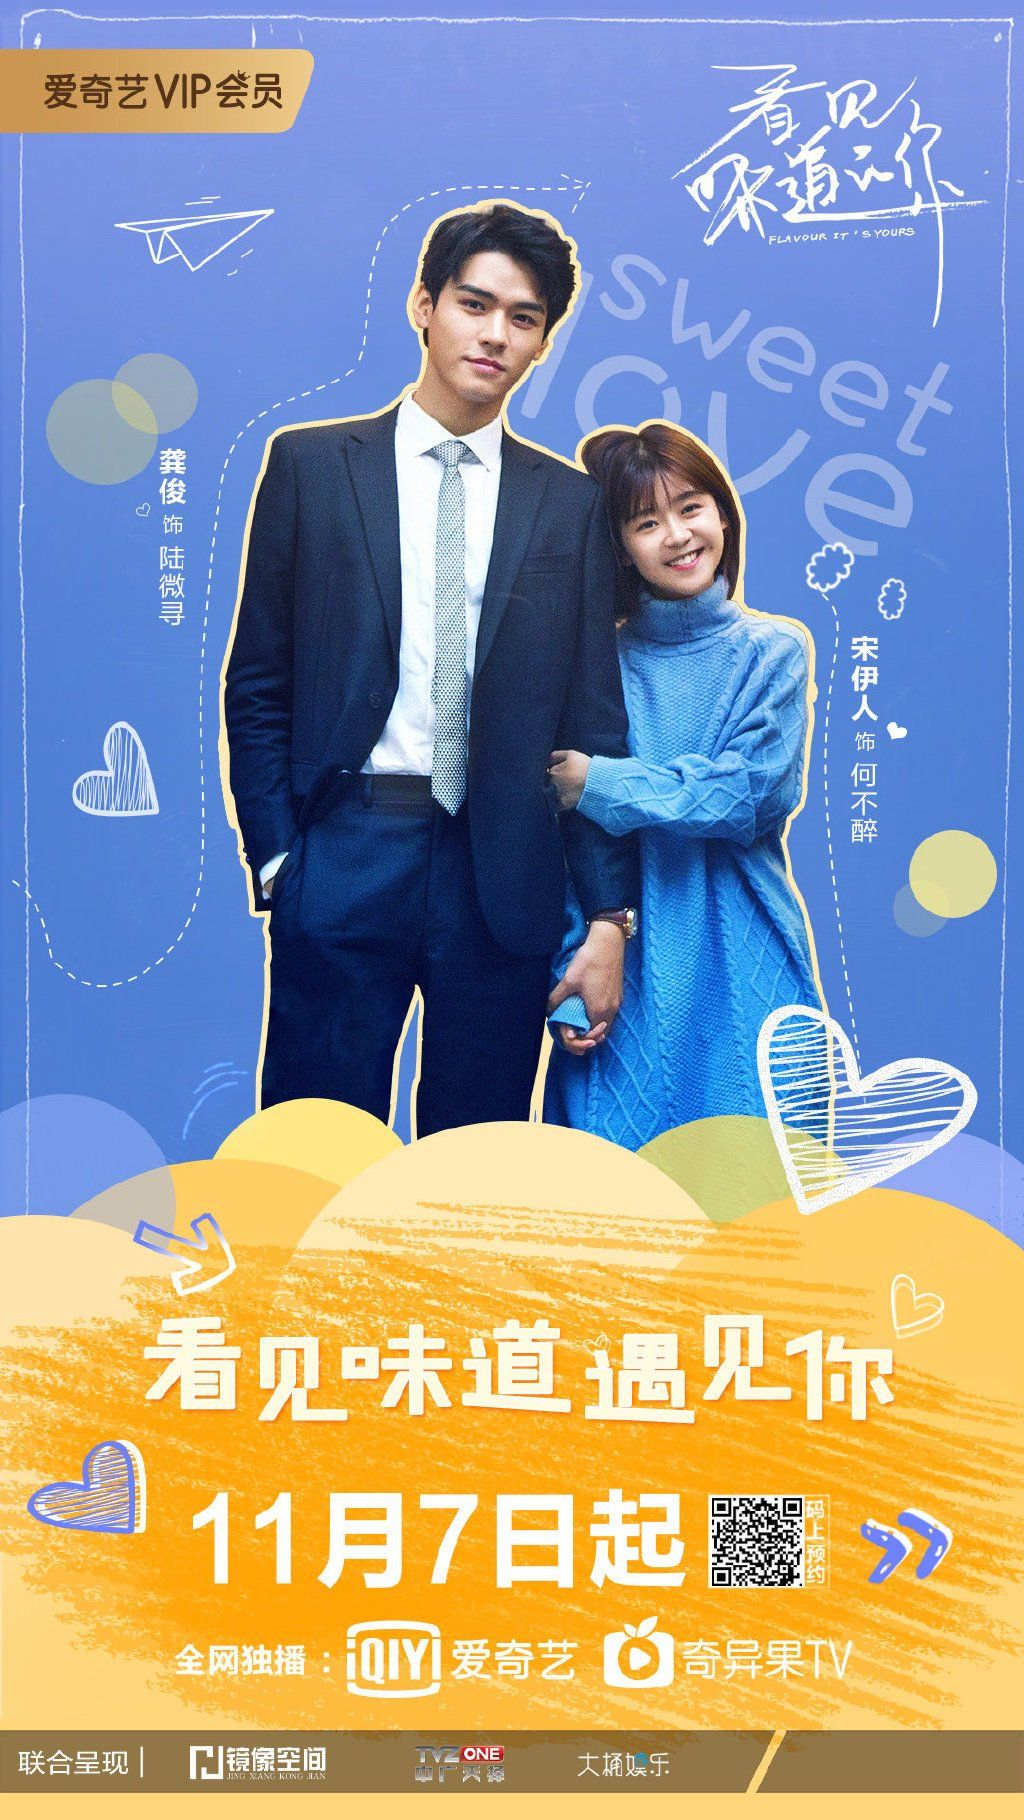 Chinesedrama Info On Twitter Korean Drama Tv Drama Tv Shows Korean Drama Movies